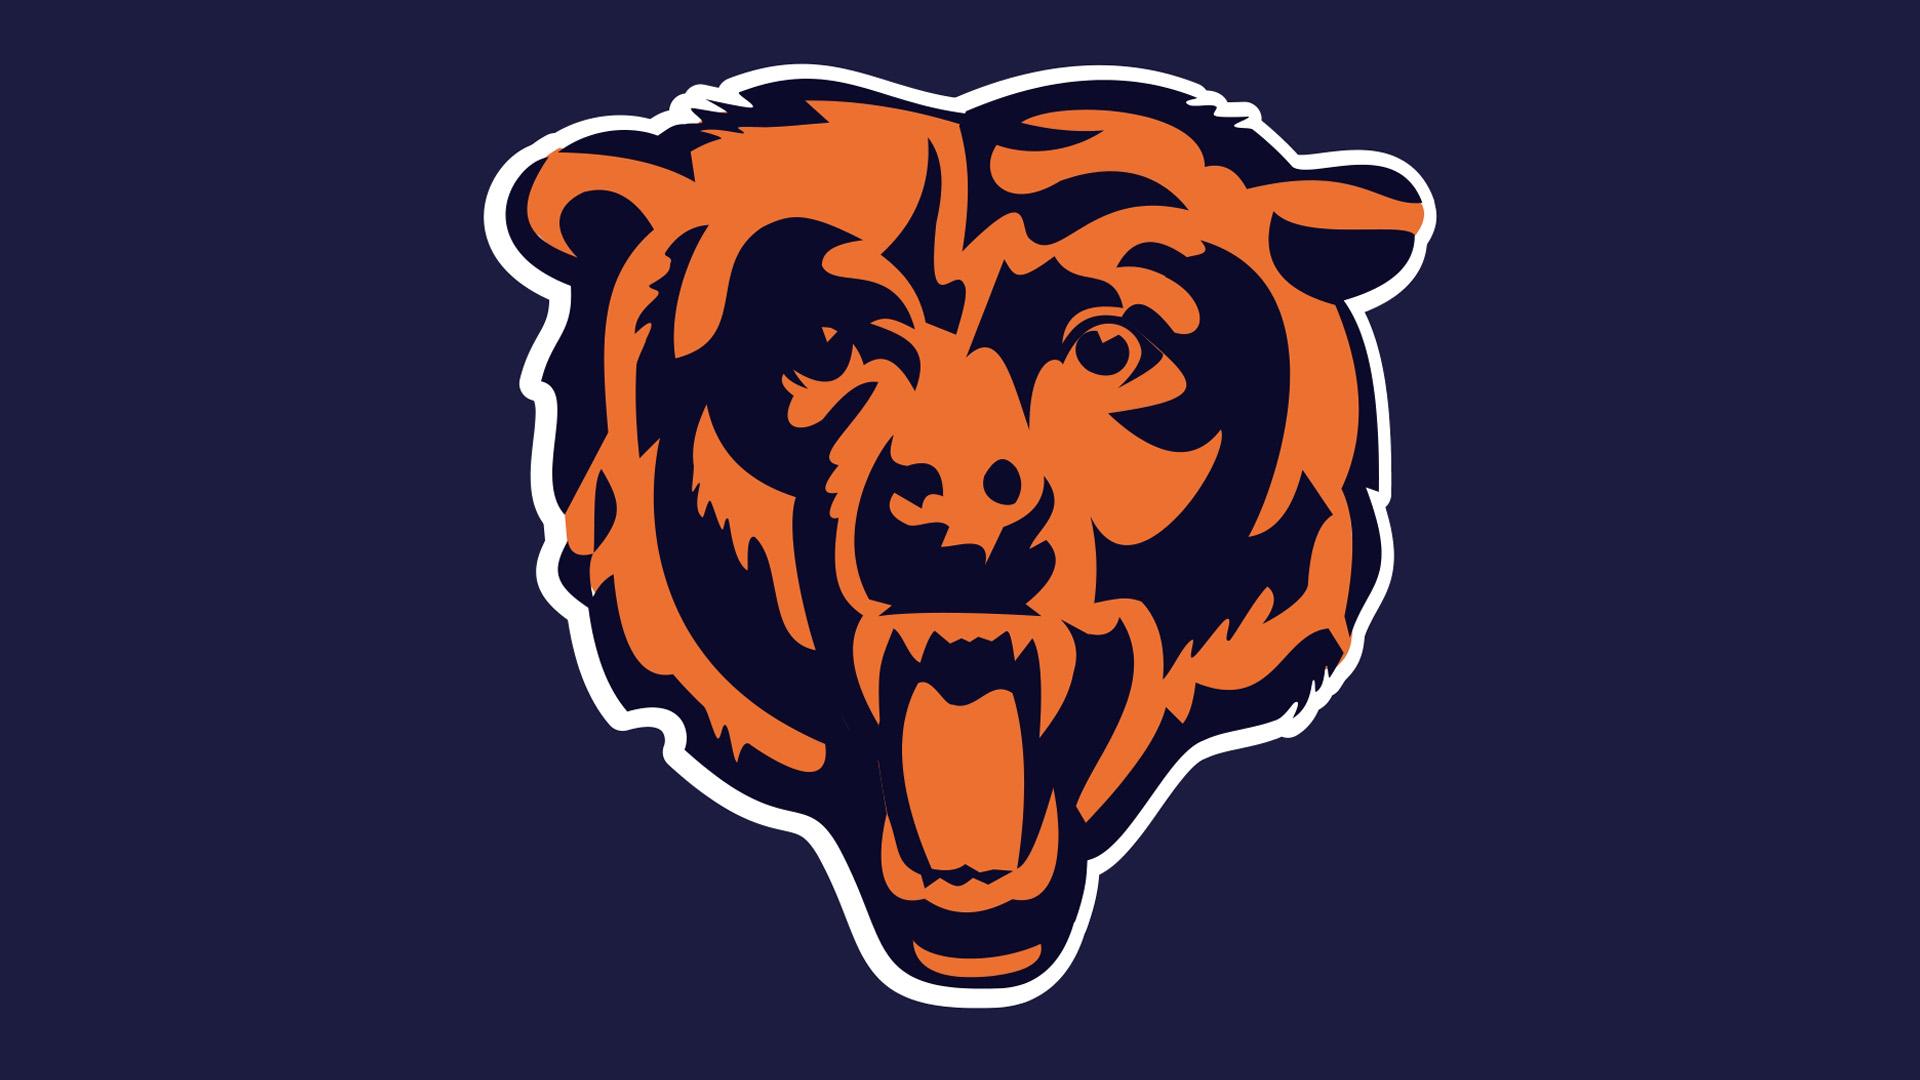 blinds wallpaper sports field chicago bears bear image 1920x1080